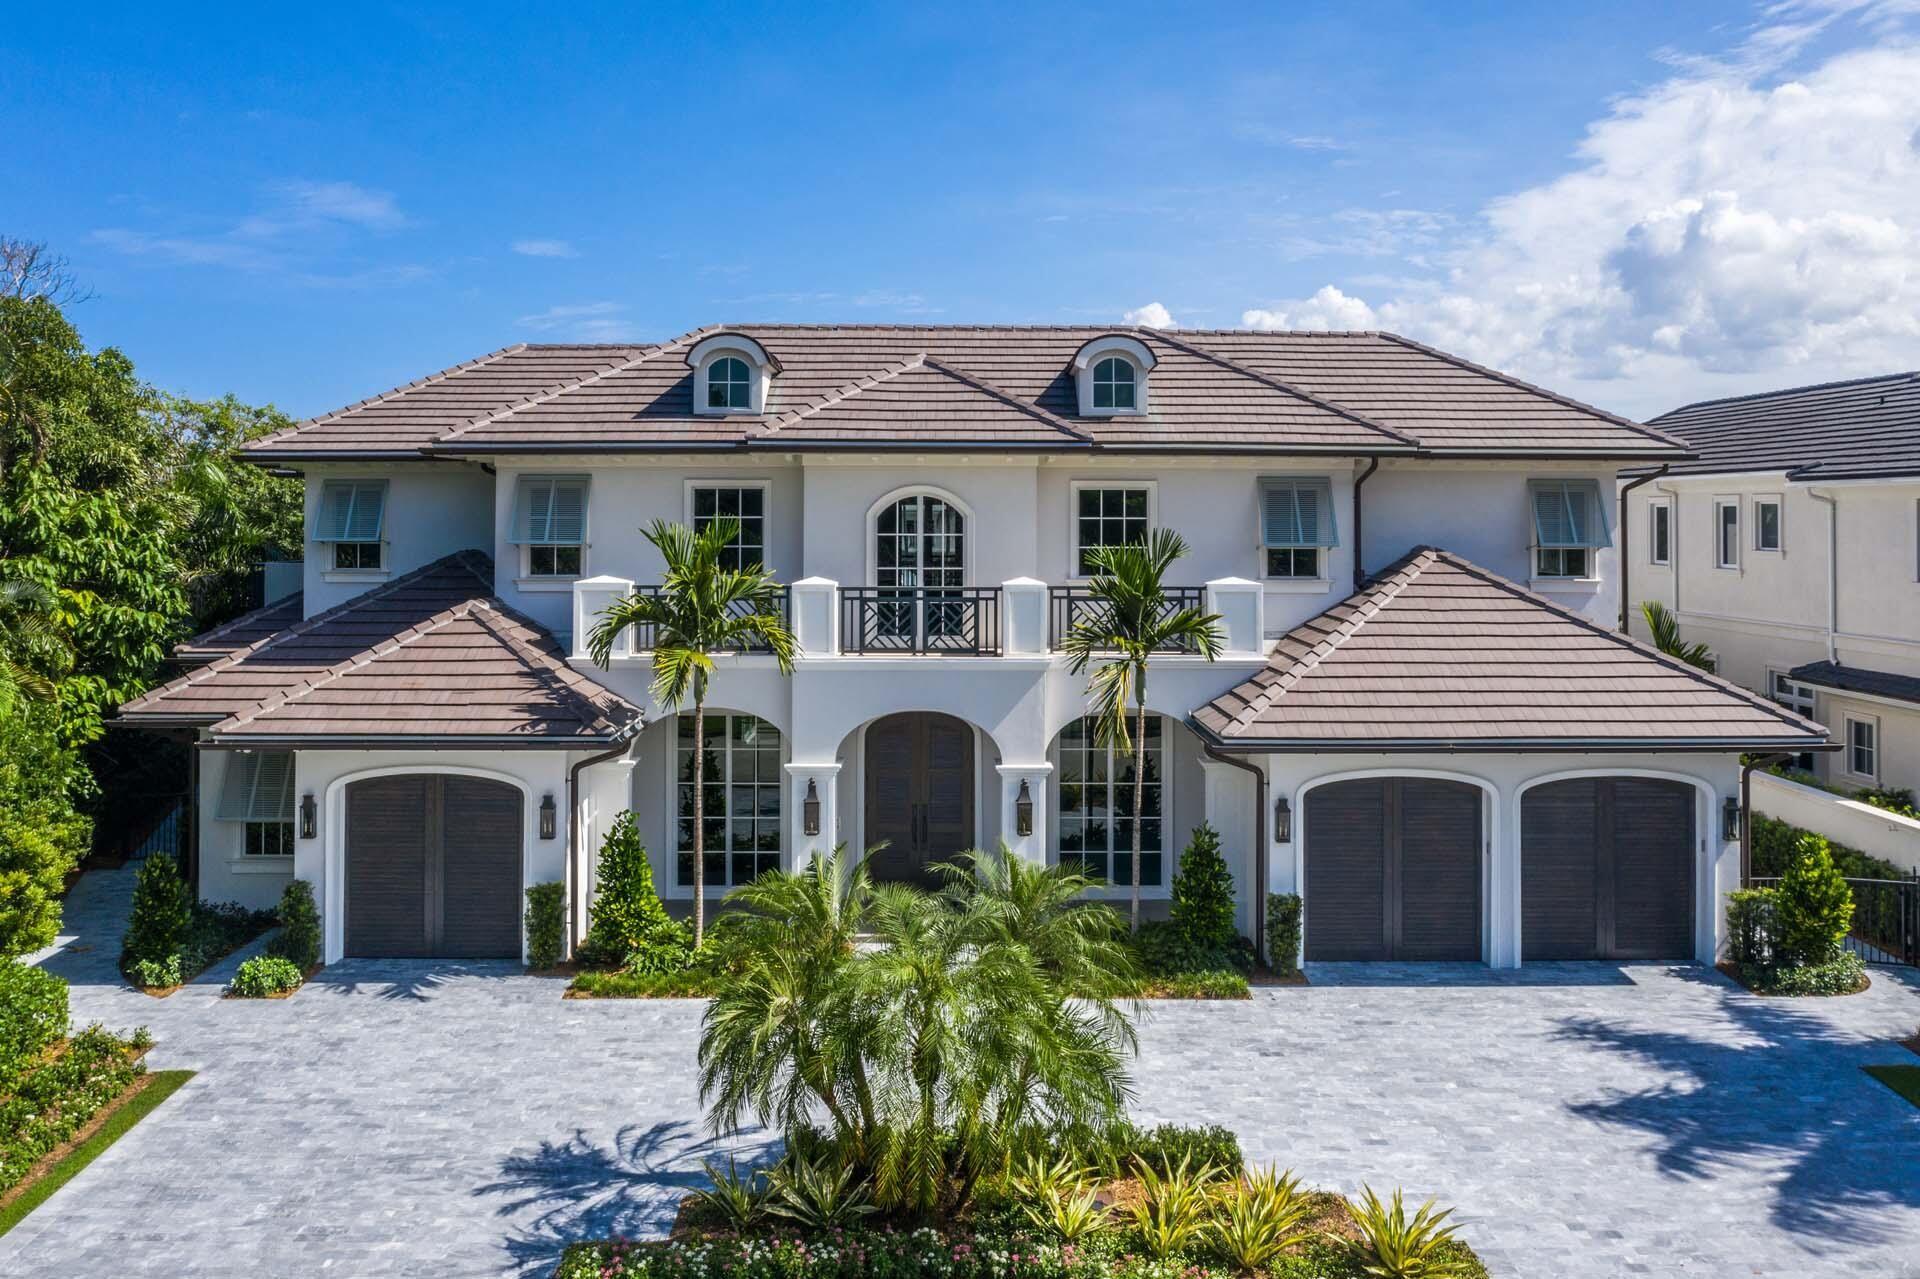 484 S Maya Palm Drive, Boca Raton, FL 33432 - #: RX-10745497